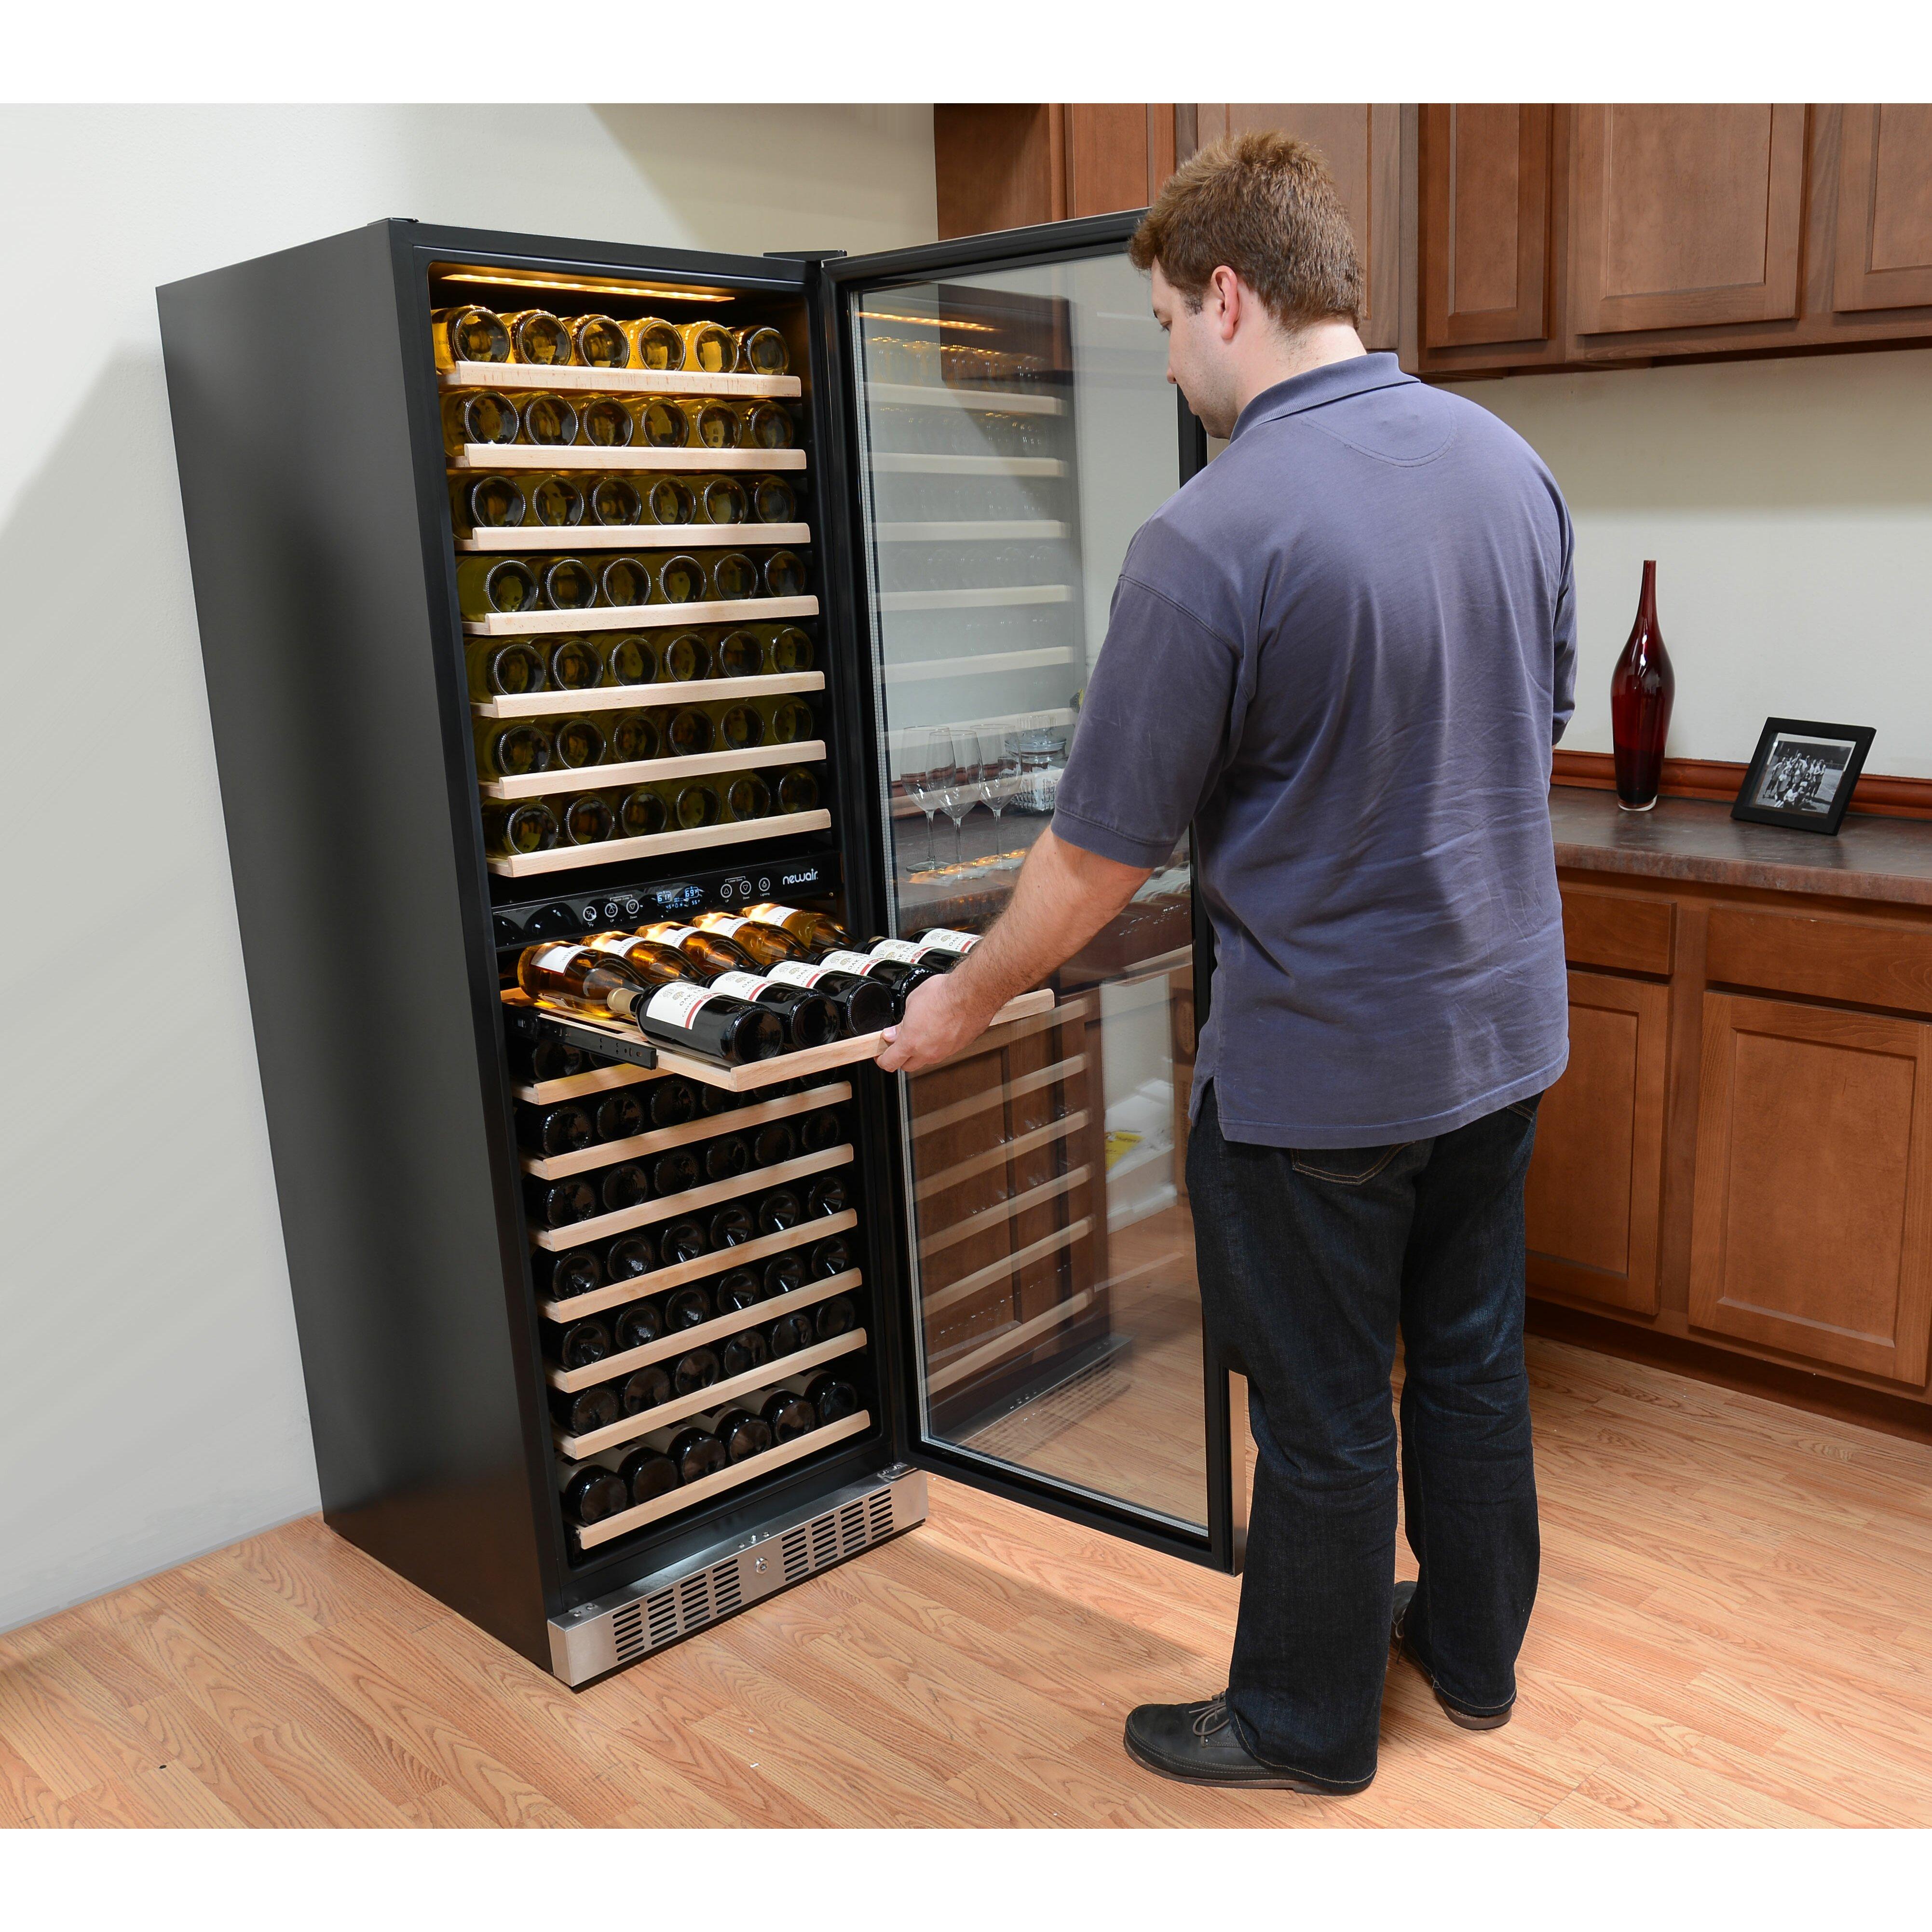 newair 160 bottle dual zone built in wine refrigerator reviews wayfair. Black Bedroom Furniture Sets. Home Design Ideas